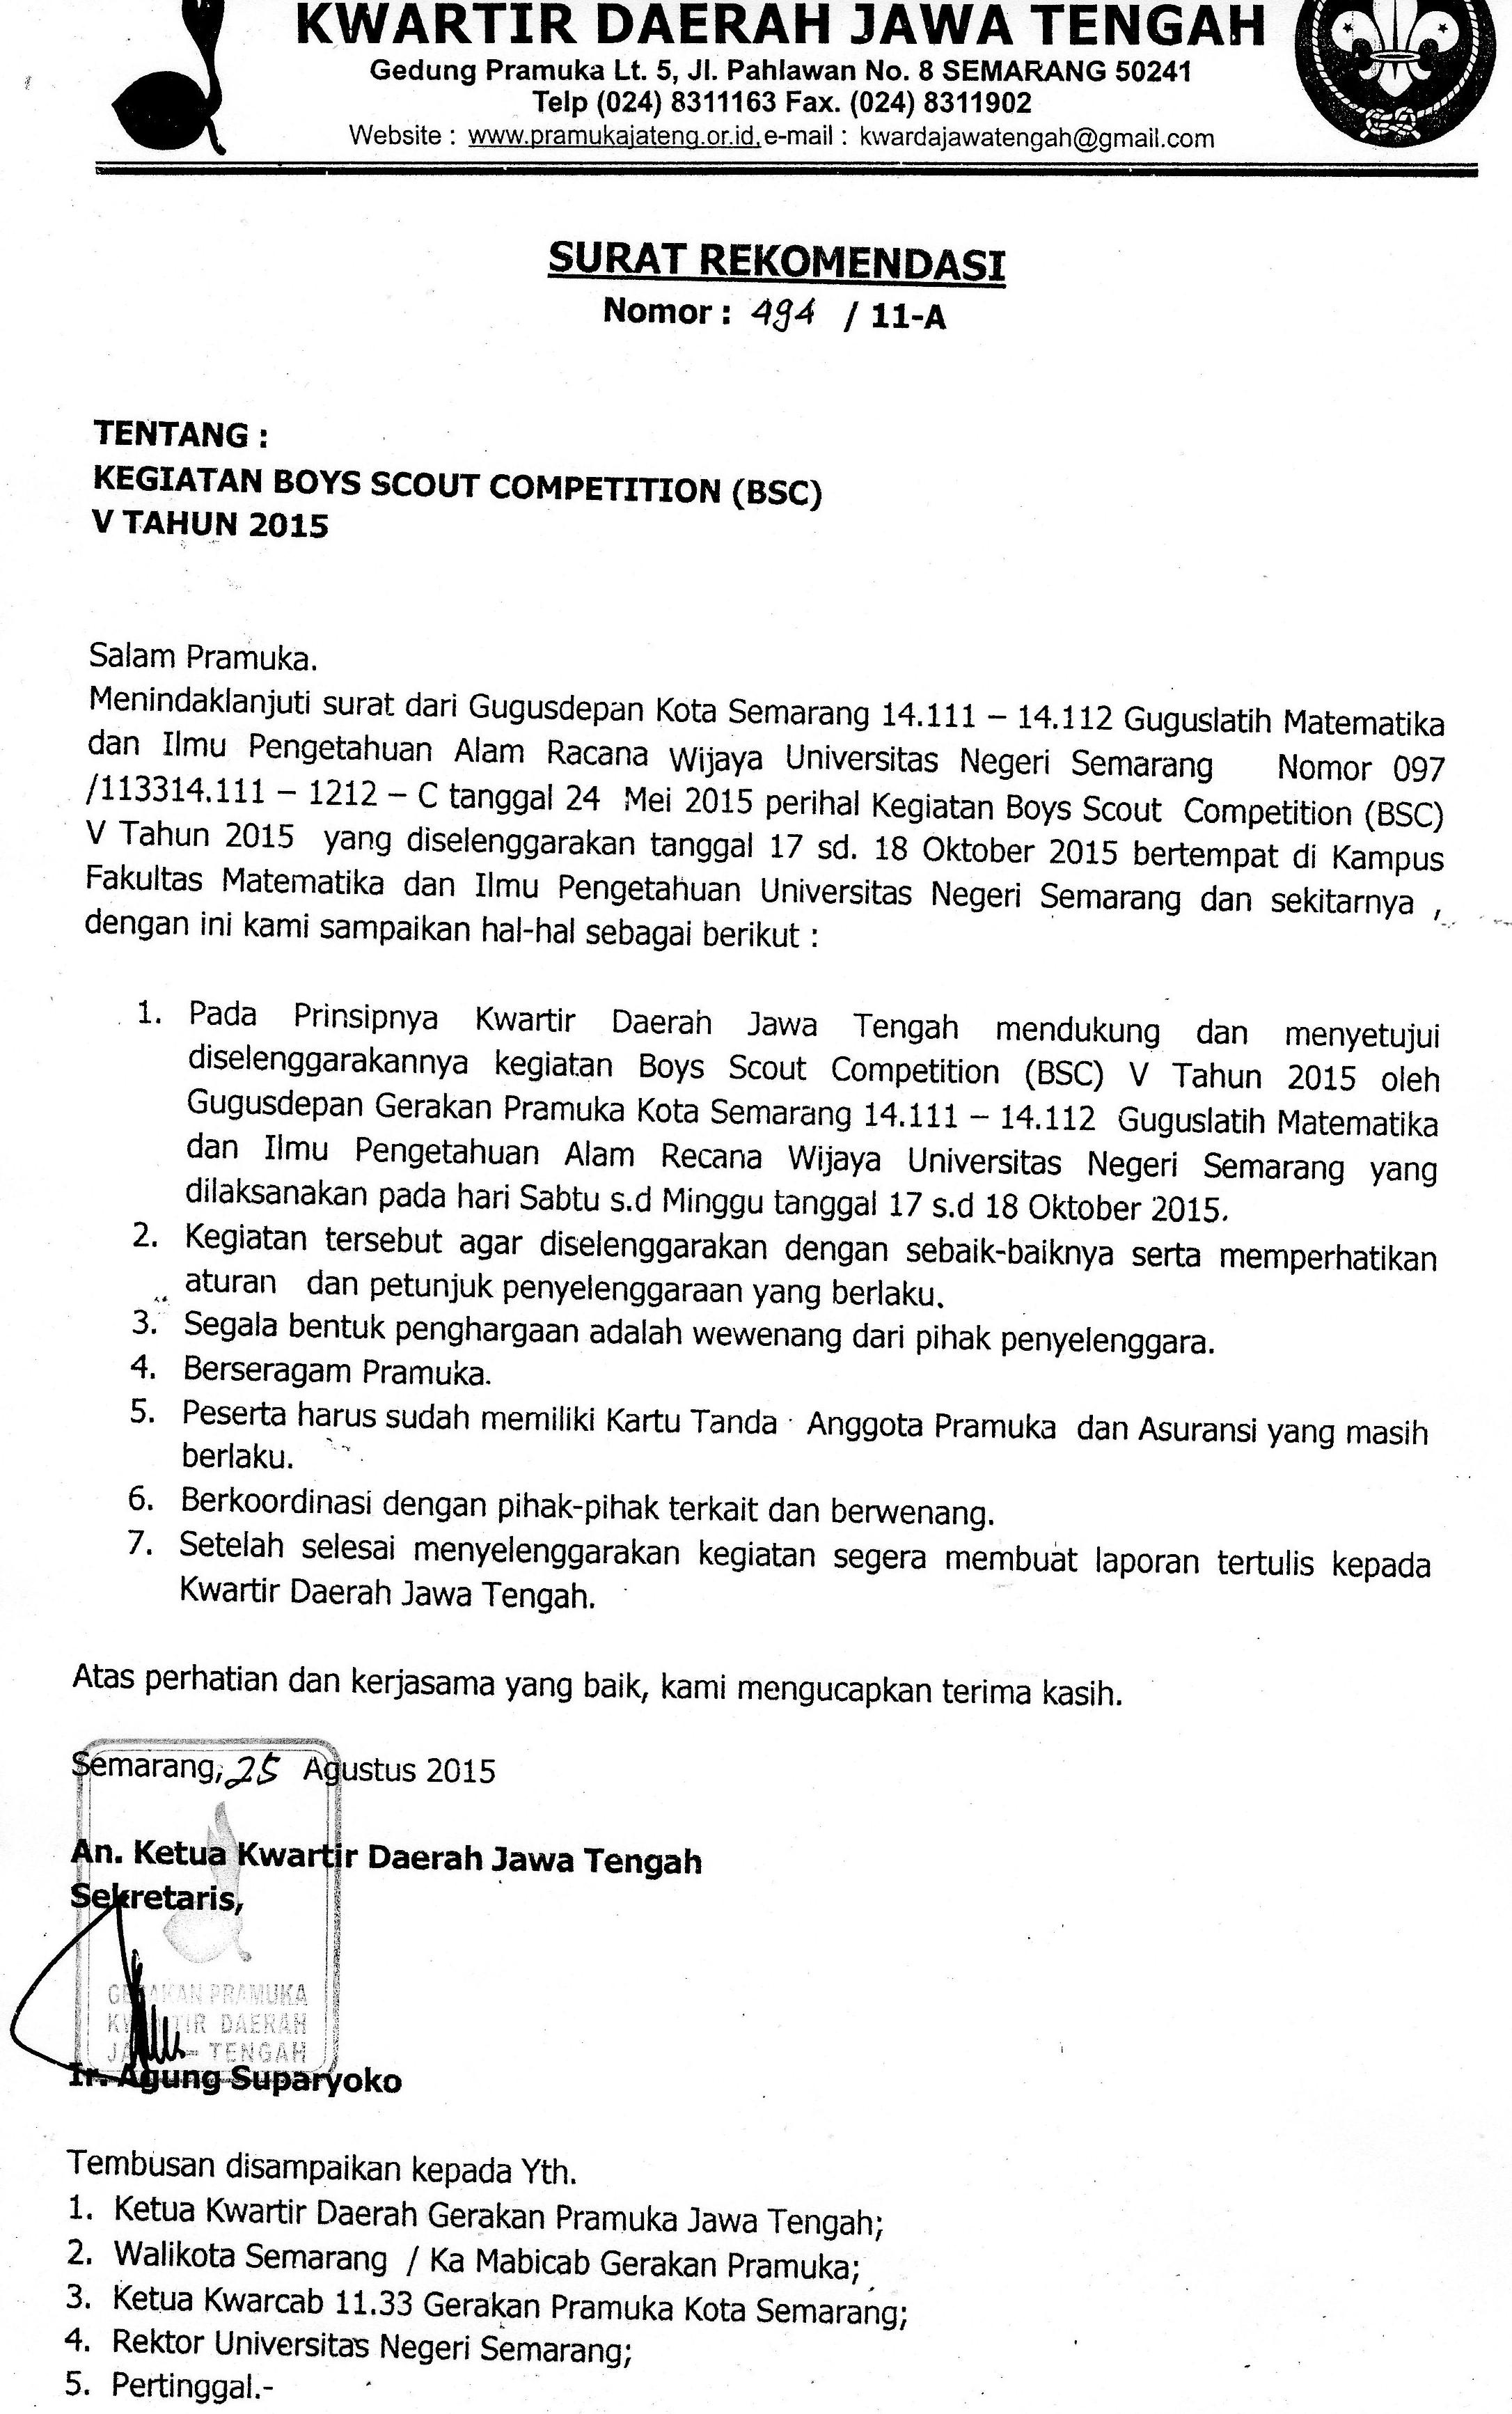 Surat Rekomendasi Kegiatan Bsc V Kwarda Jawa Tengah